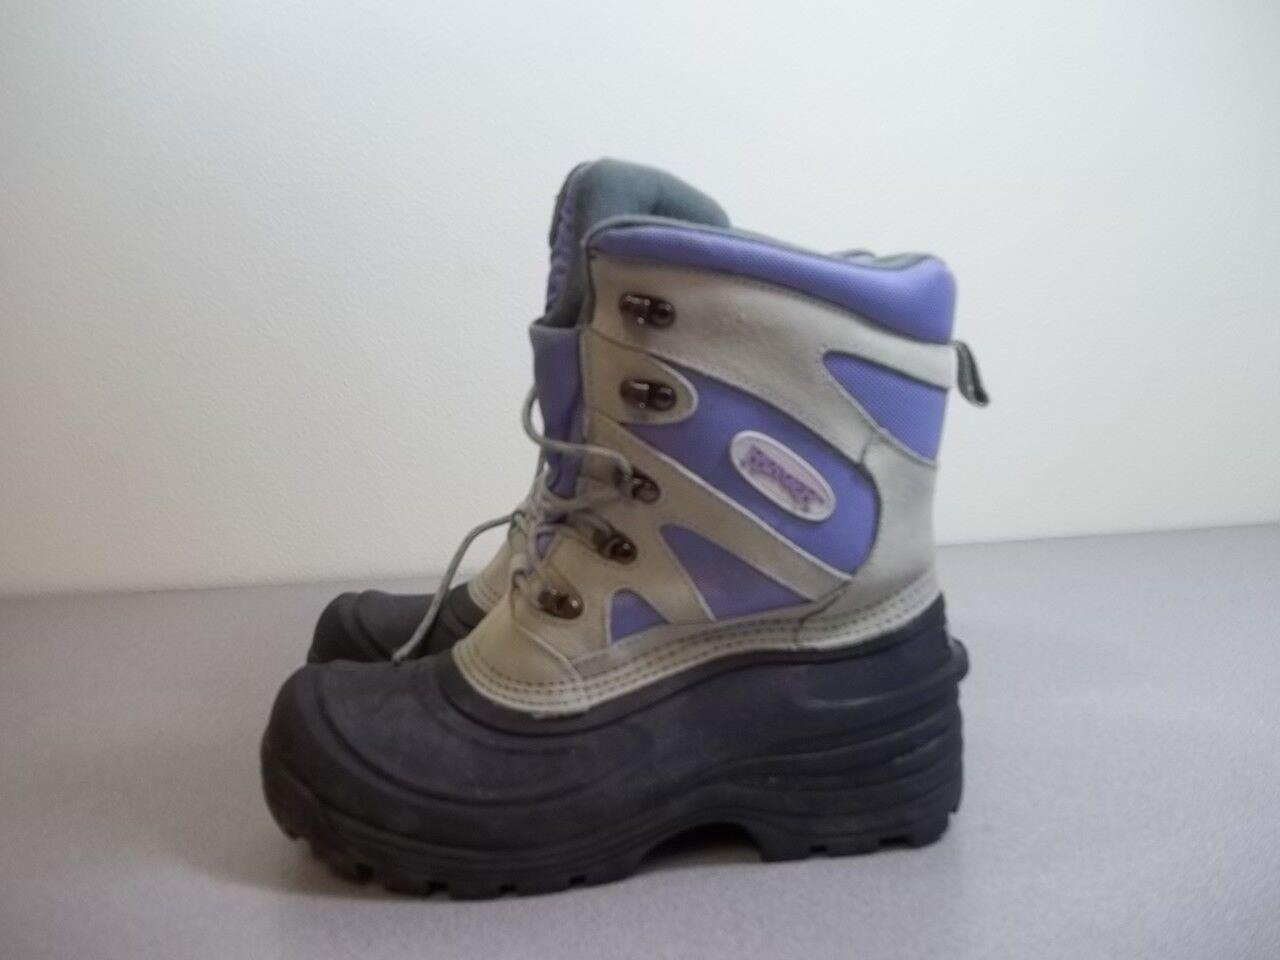 Ranger Cálido Impermeable Invierno botas Nieve Con Cordones Púrpura Para Mujer